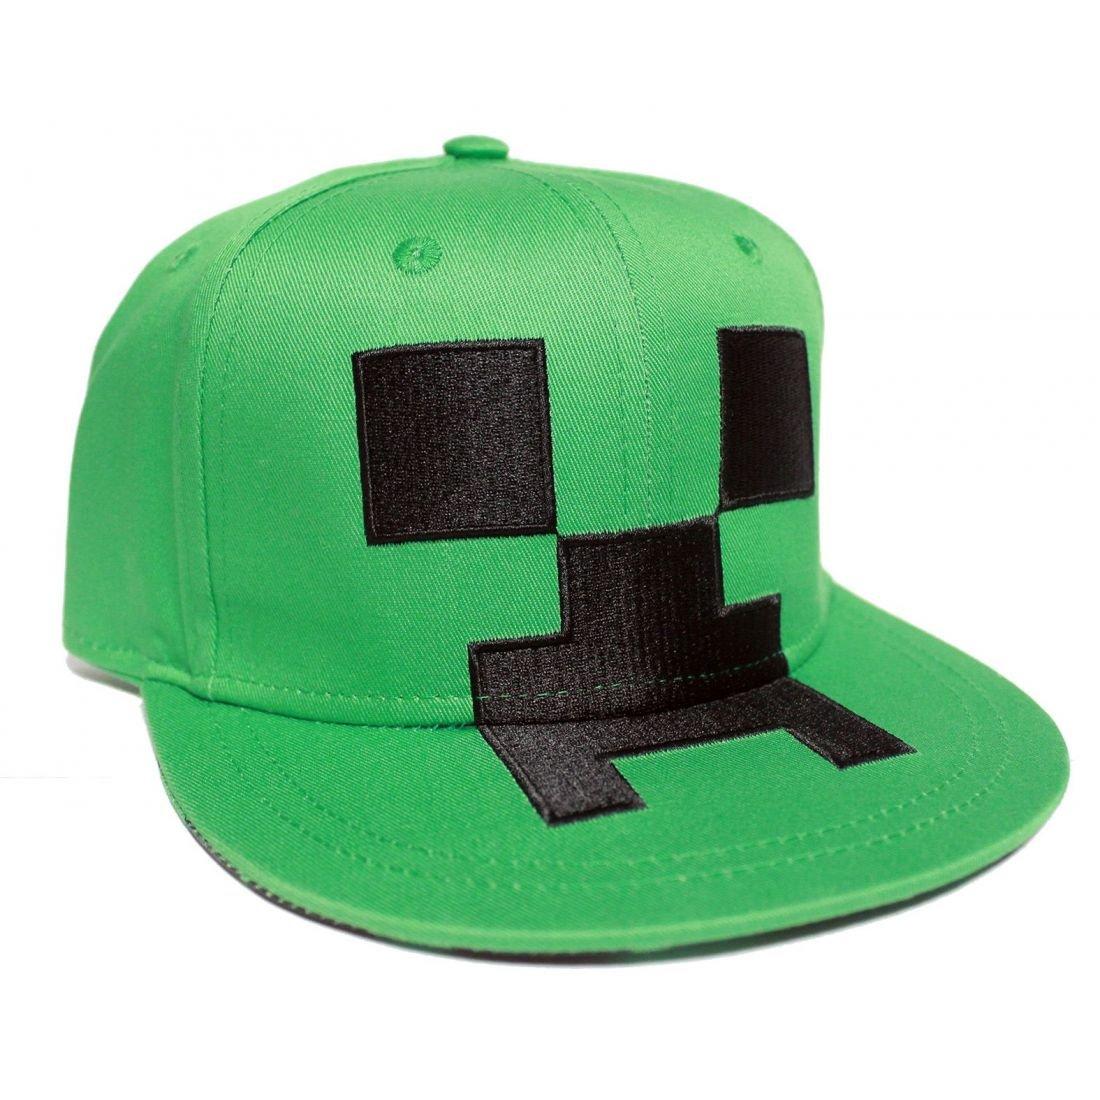 Minecraft Snapback Cap Creeper Basecap Baumwolle grün Elbenwald 1610